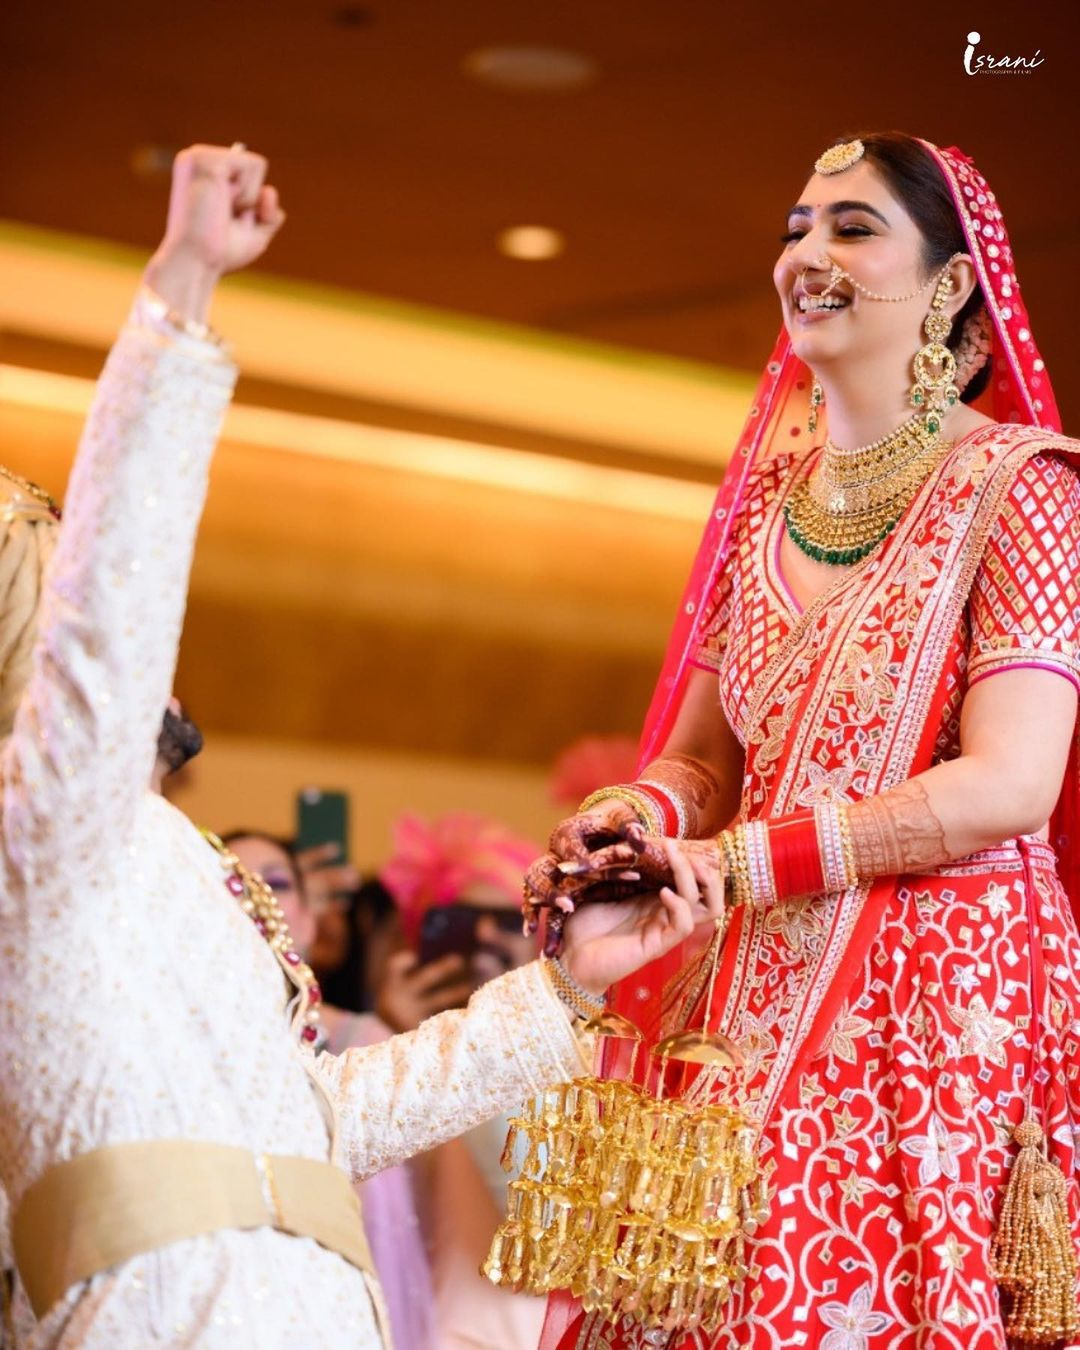 rahul vaidya and disha parmar wedding